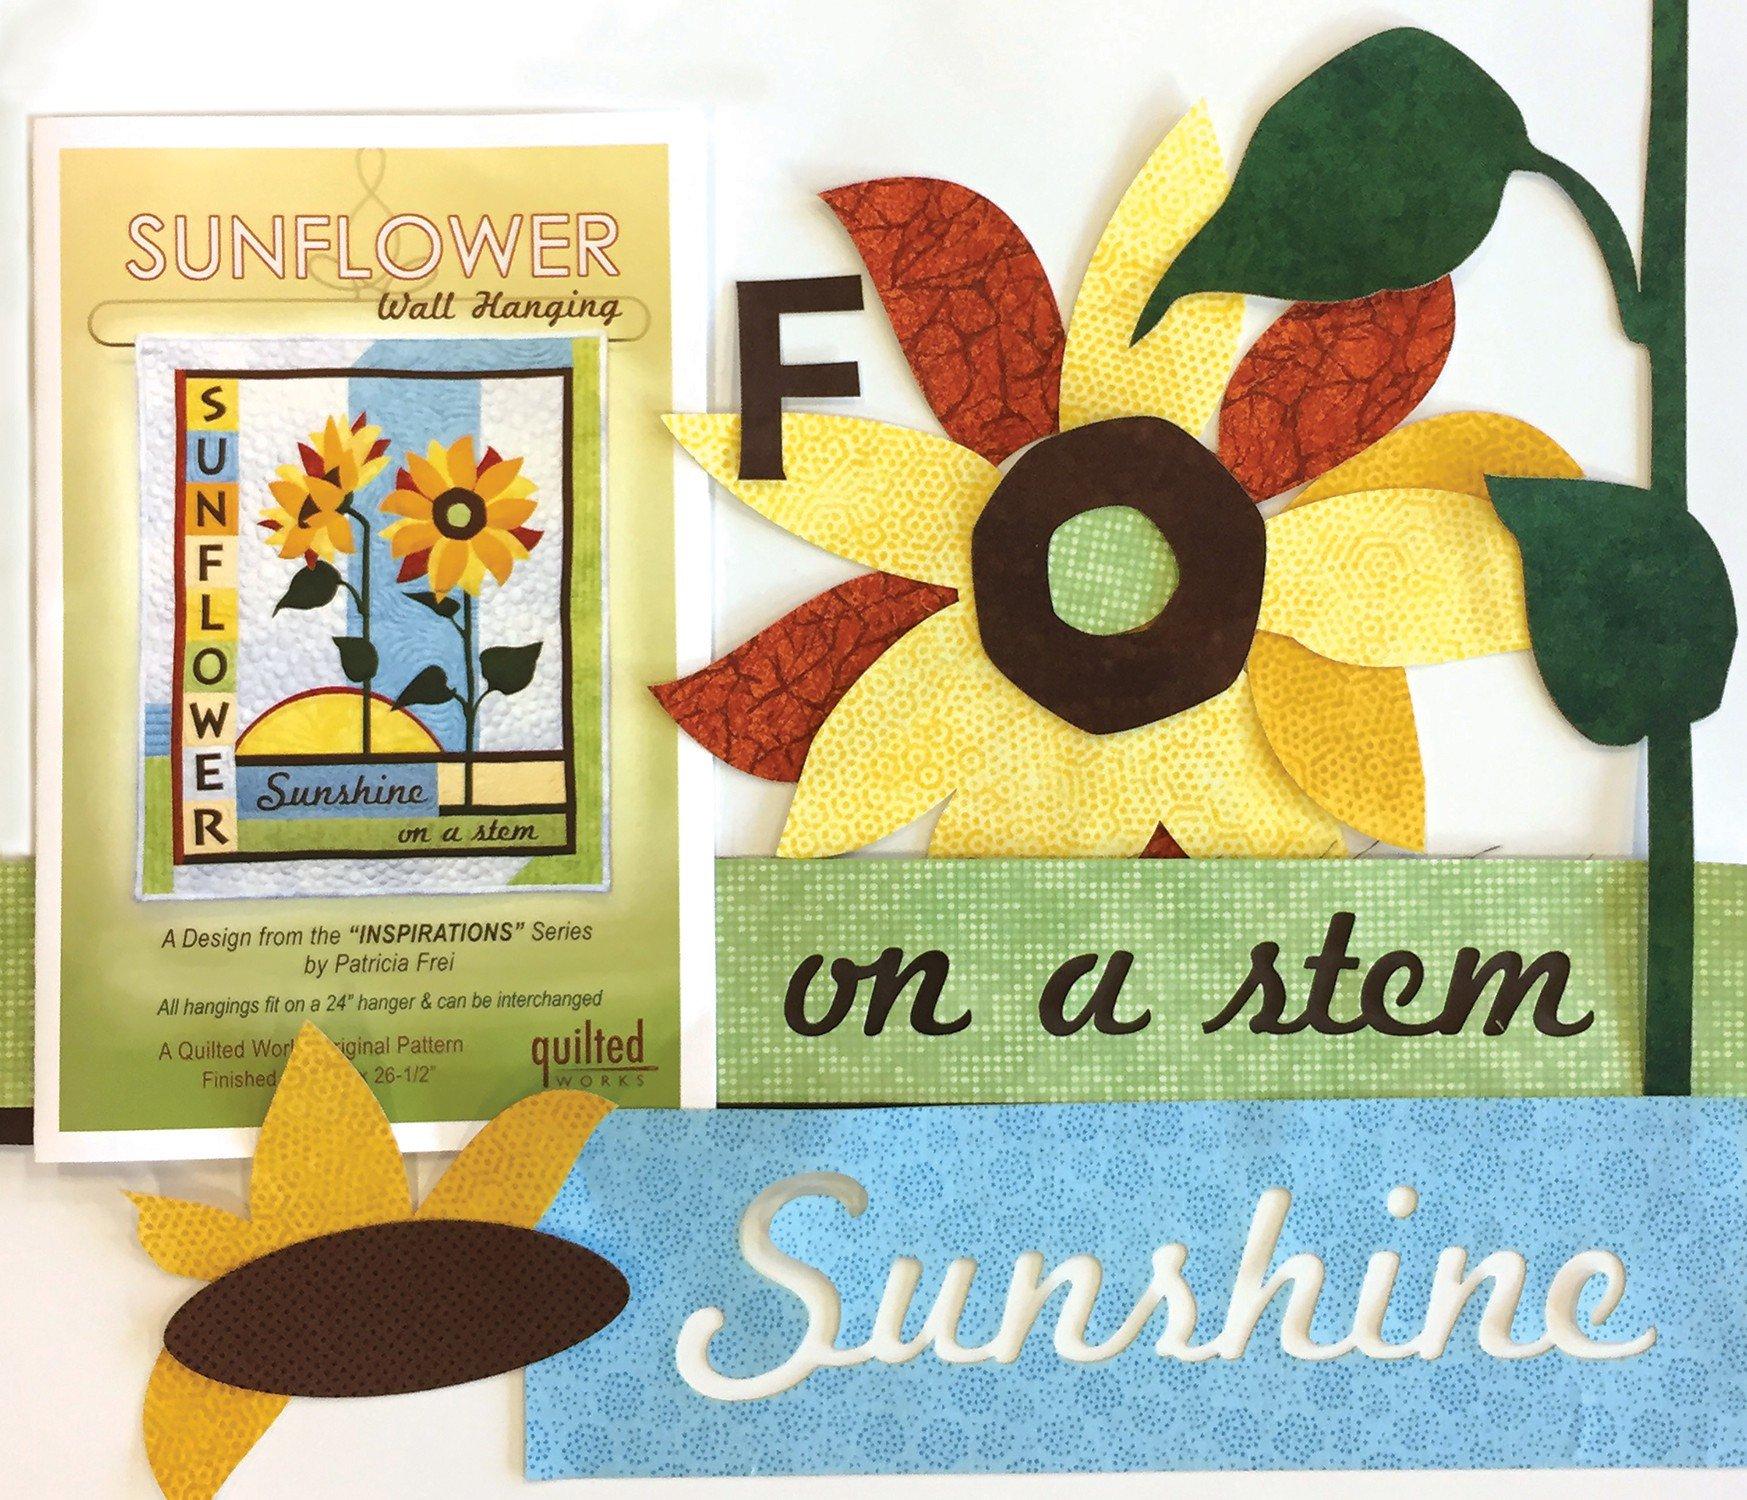 Sunflower Complete Laser Kit